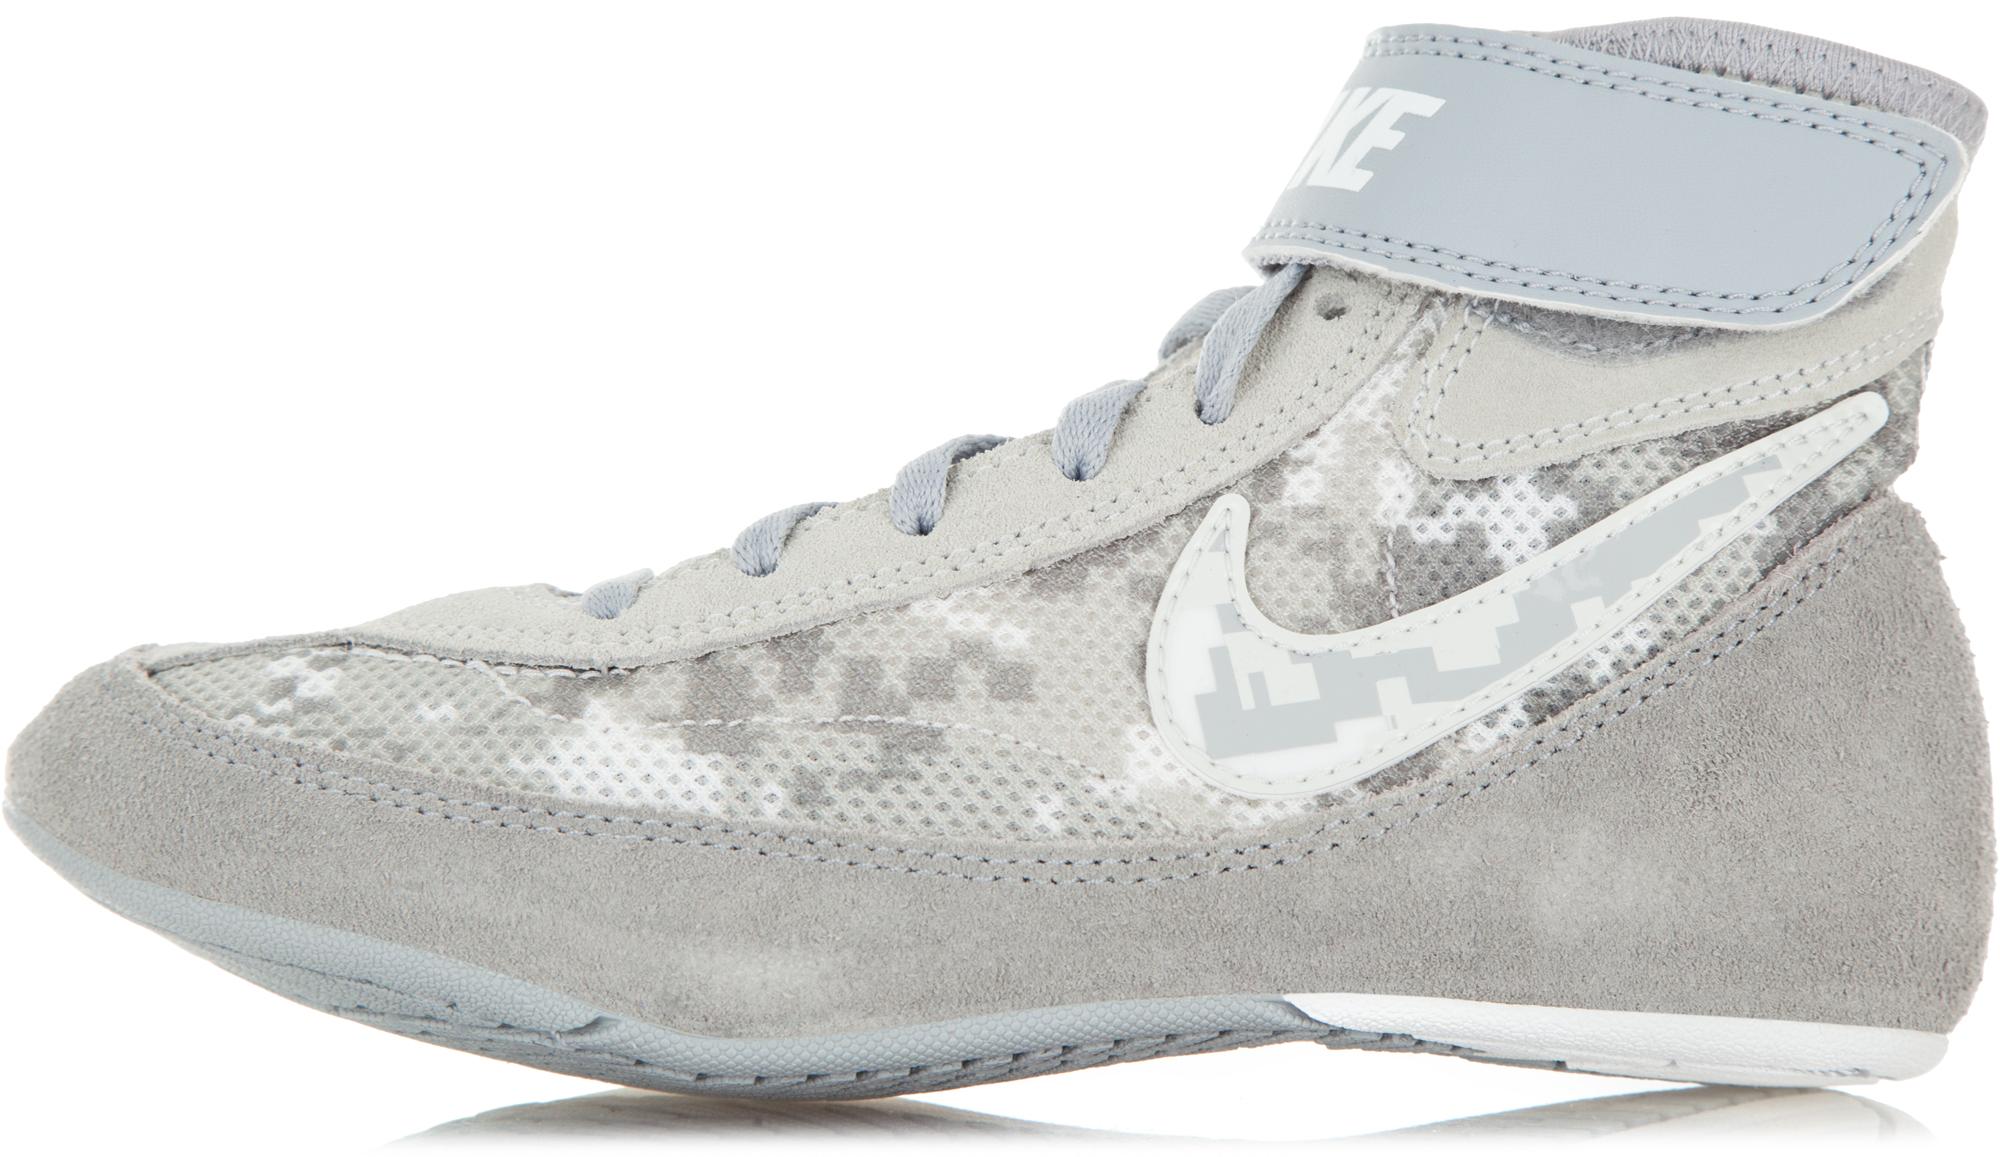 Nike Борцовки для мальчиков Nike Speedsweep Vii, размер 37,5 борцовки adidas combat speed 5 серо желтые ba8006